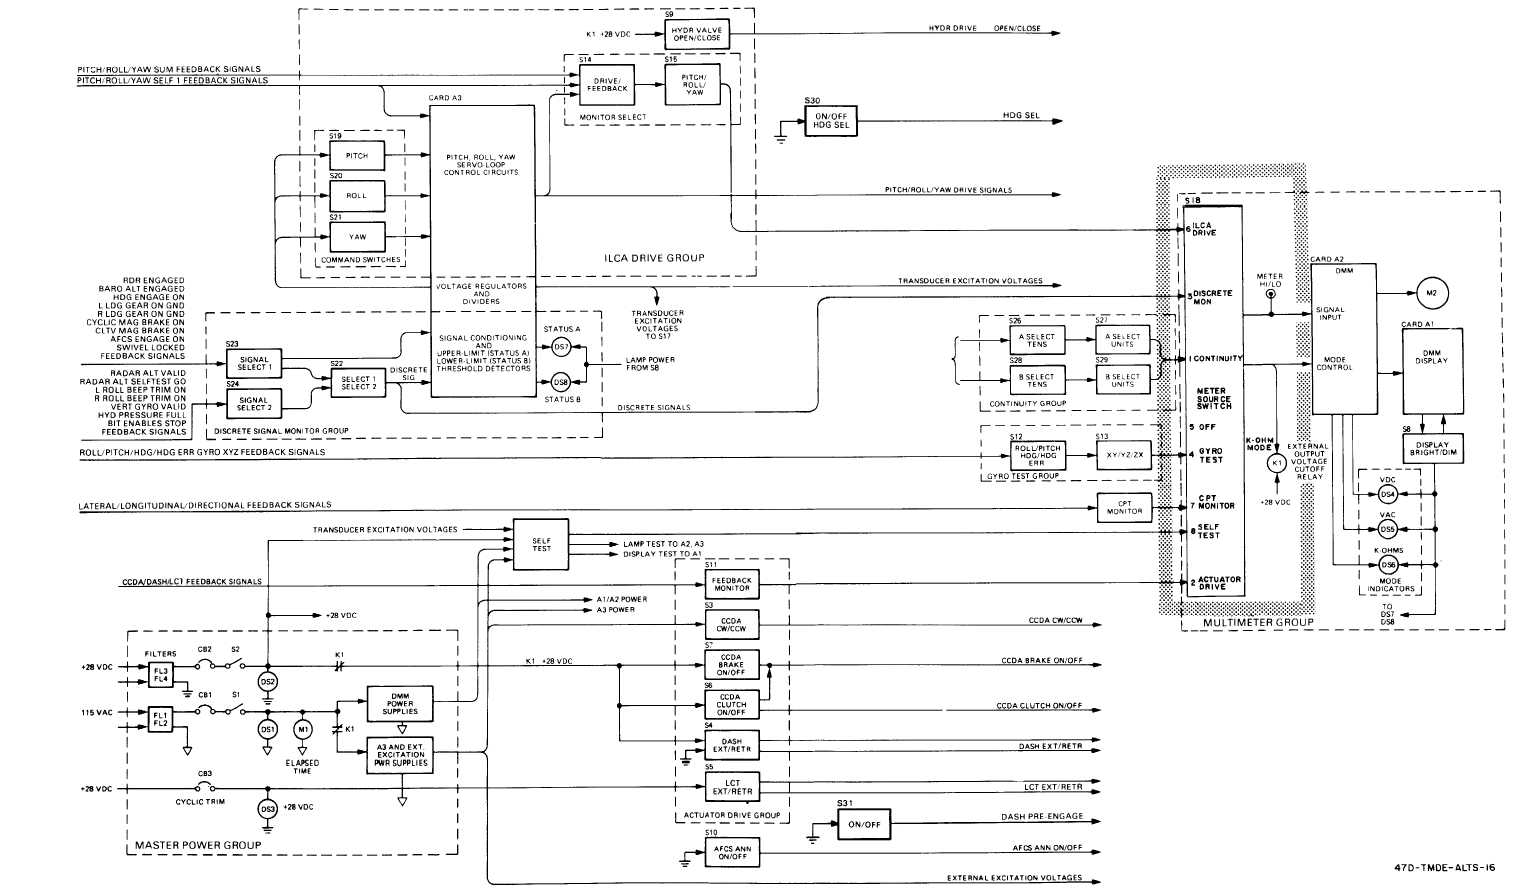 FO-1. A FCS Line Test Set Block Diagram